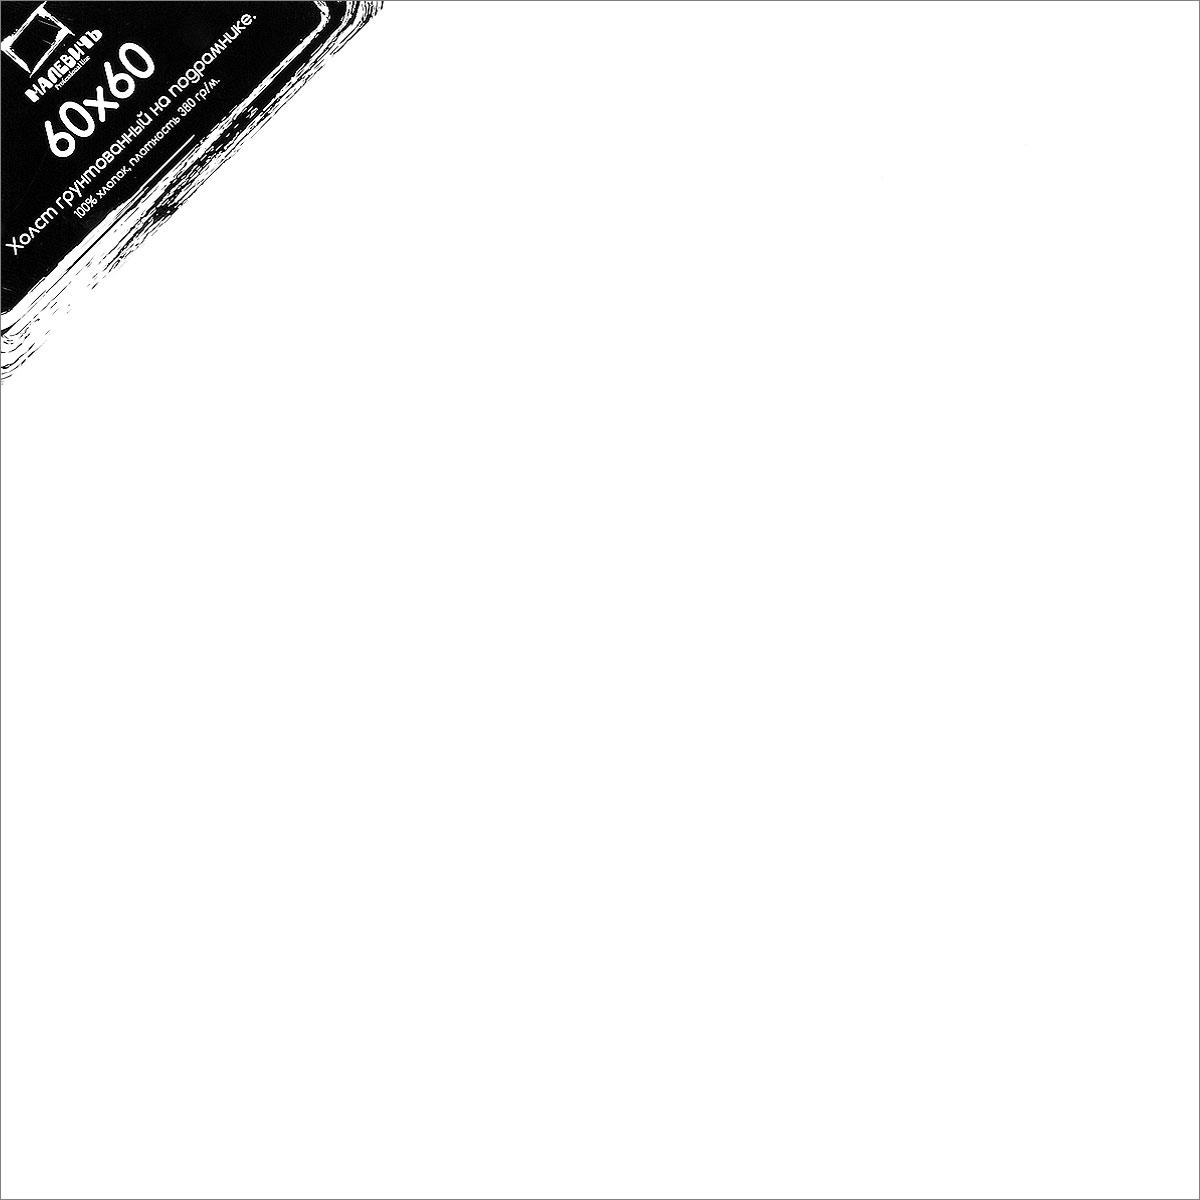 Малевичъ Холст на подрамнике 60 см x 60 см 380 г/м2